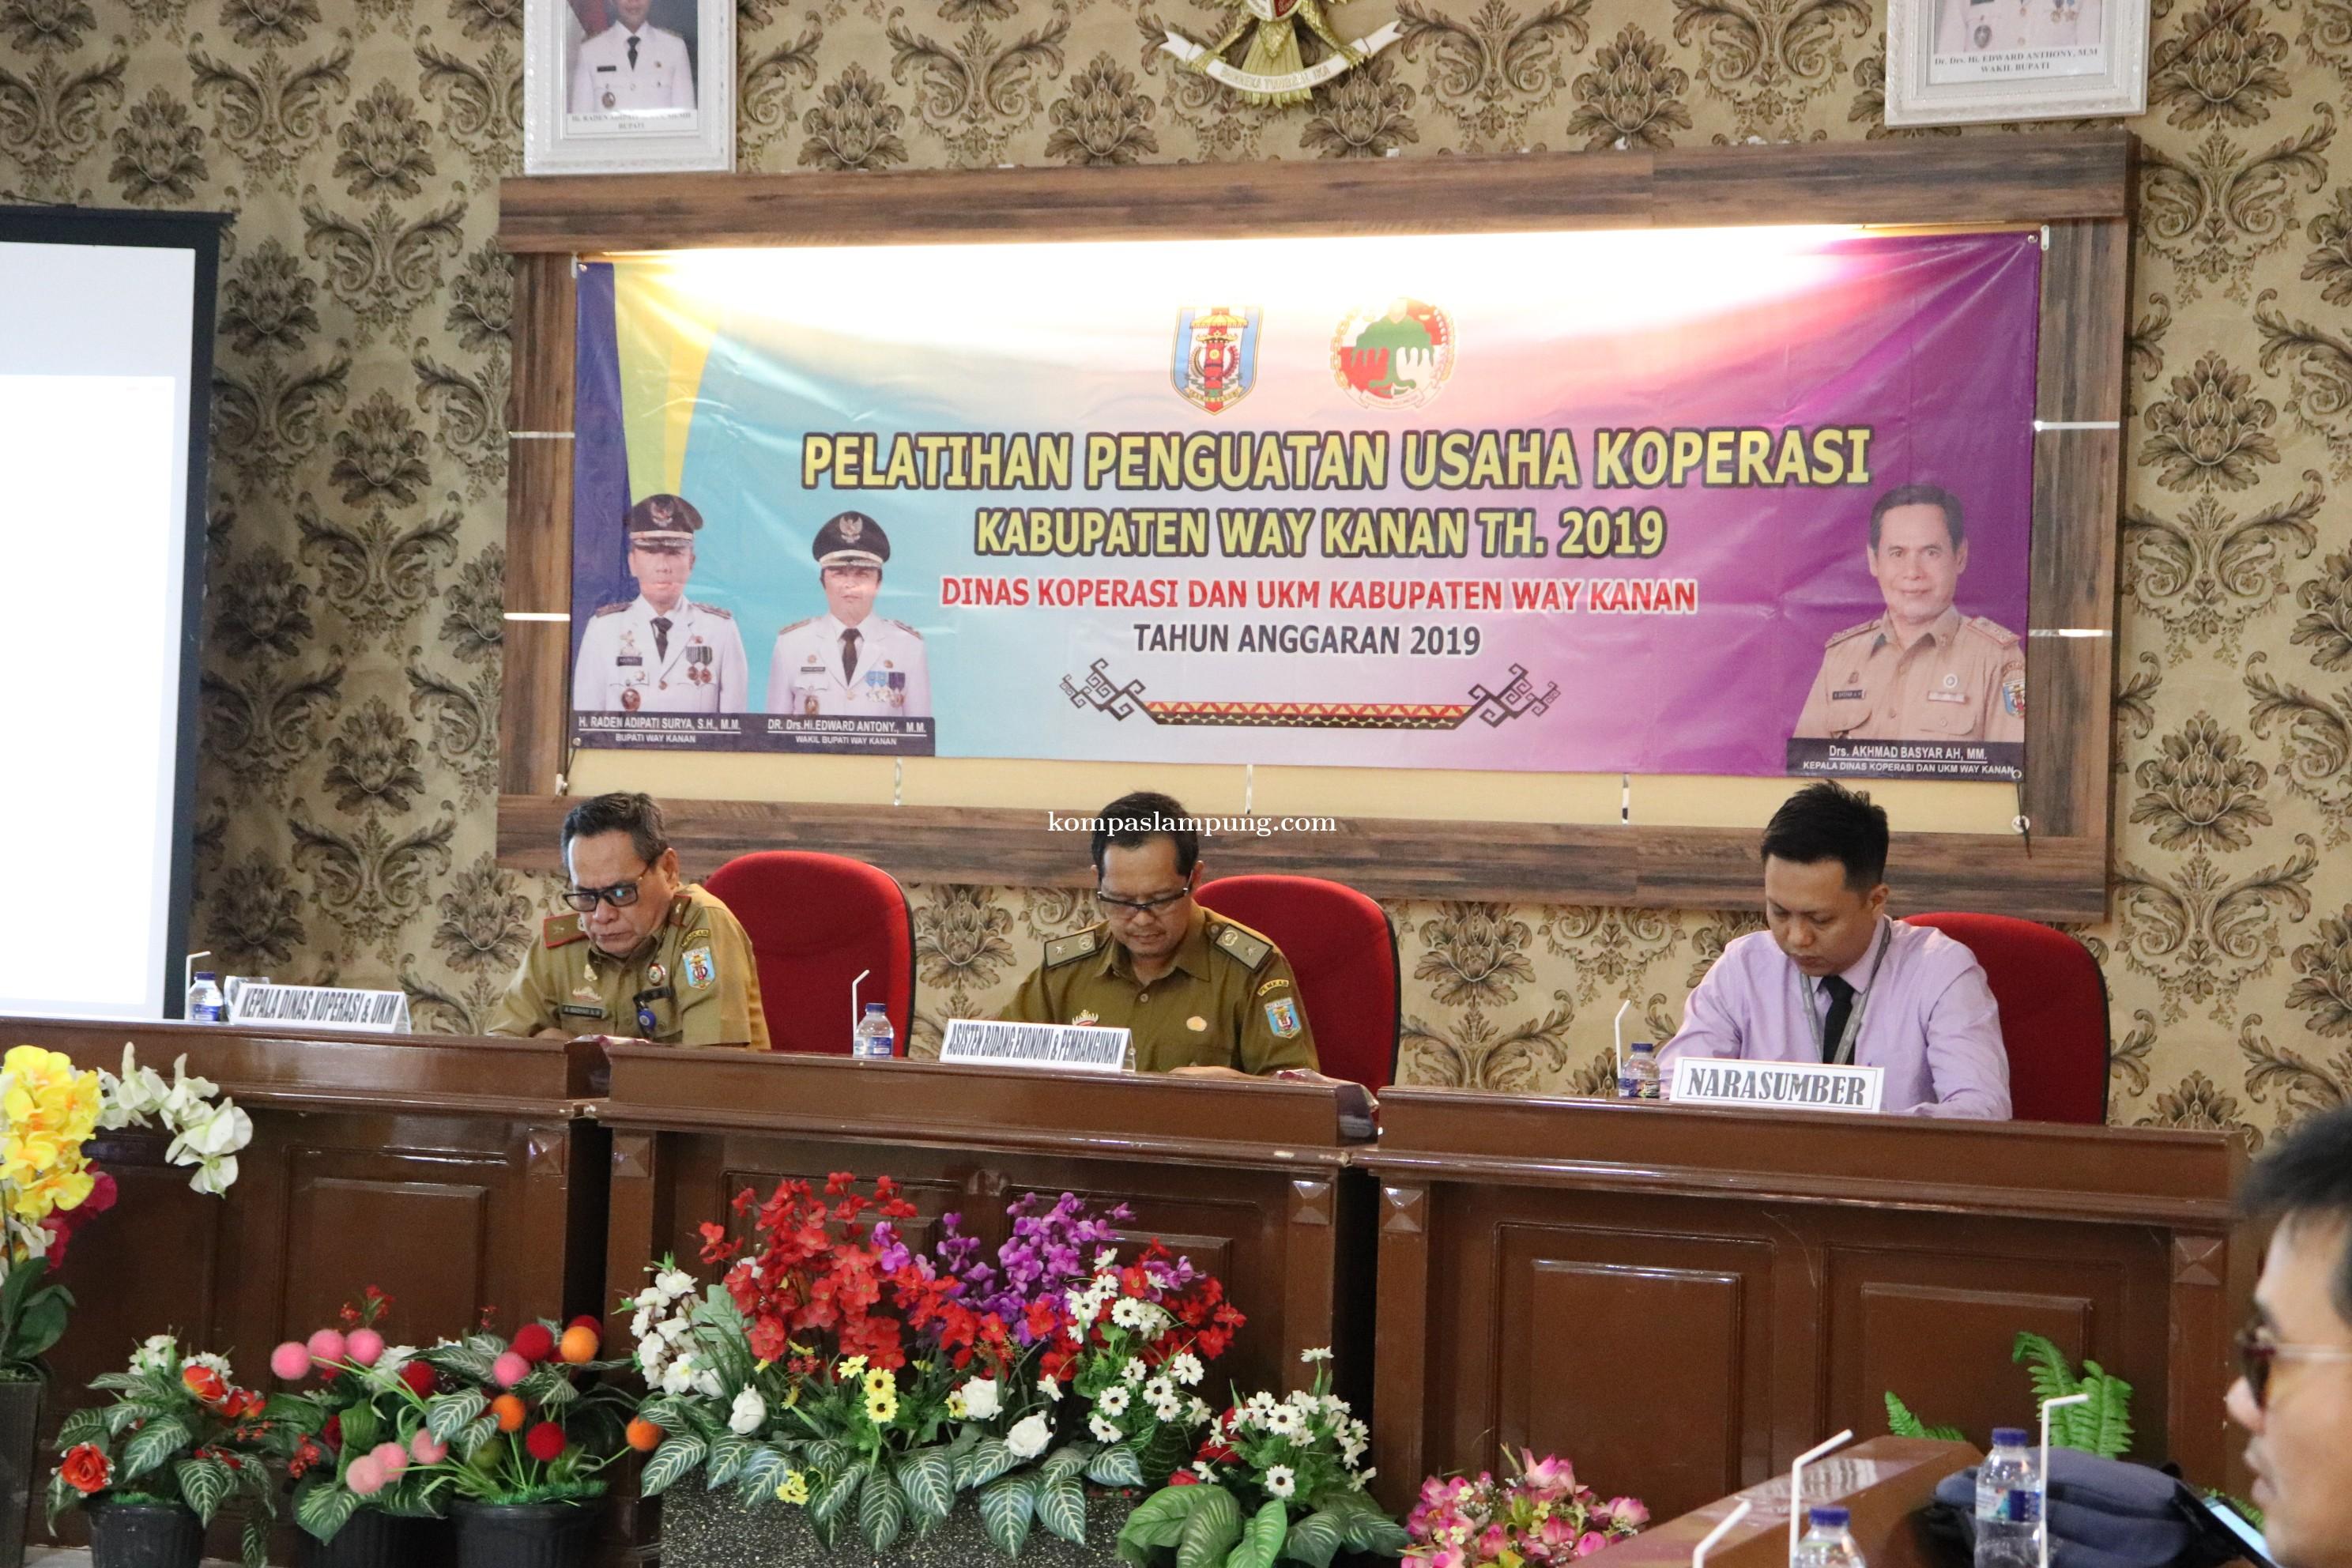 Asisten II Kussarwono Buka Pelatihan Penguatan Usaha Koperasi